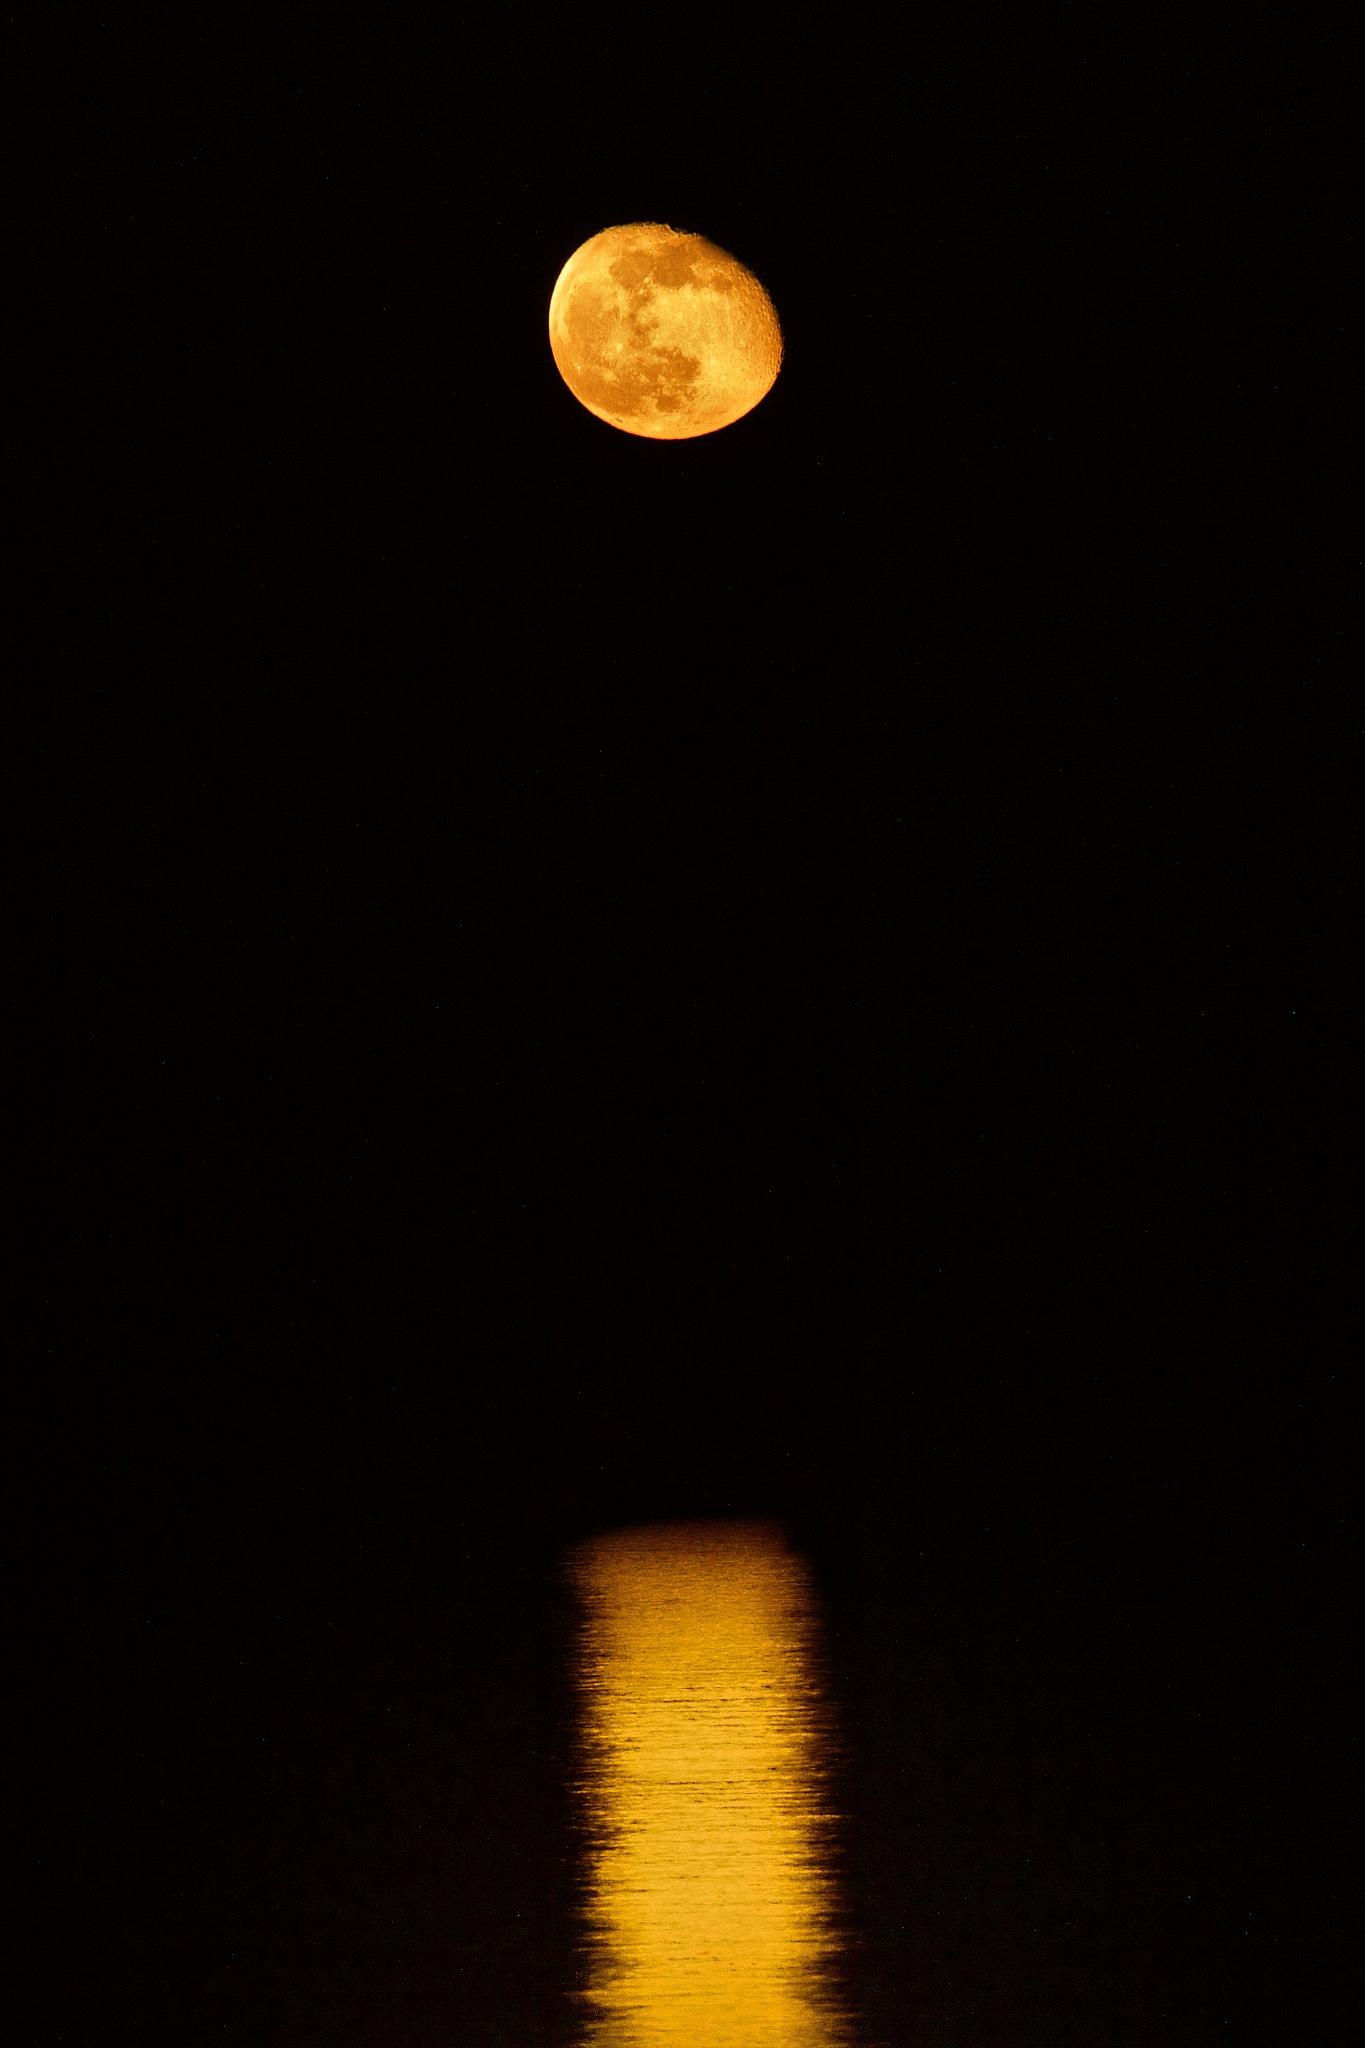 Moonrise 15-03-17 by MarkBrooks